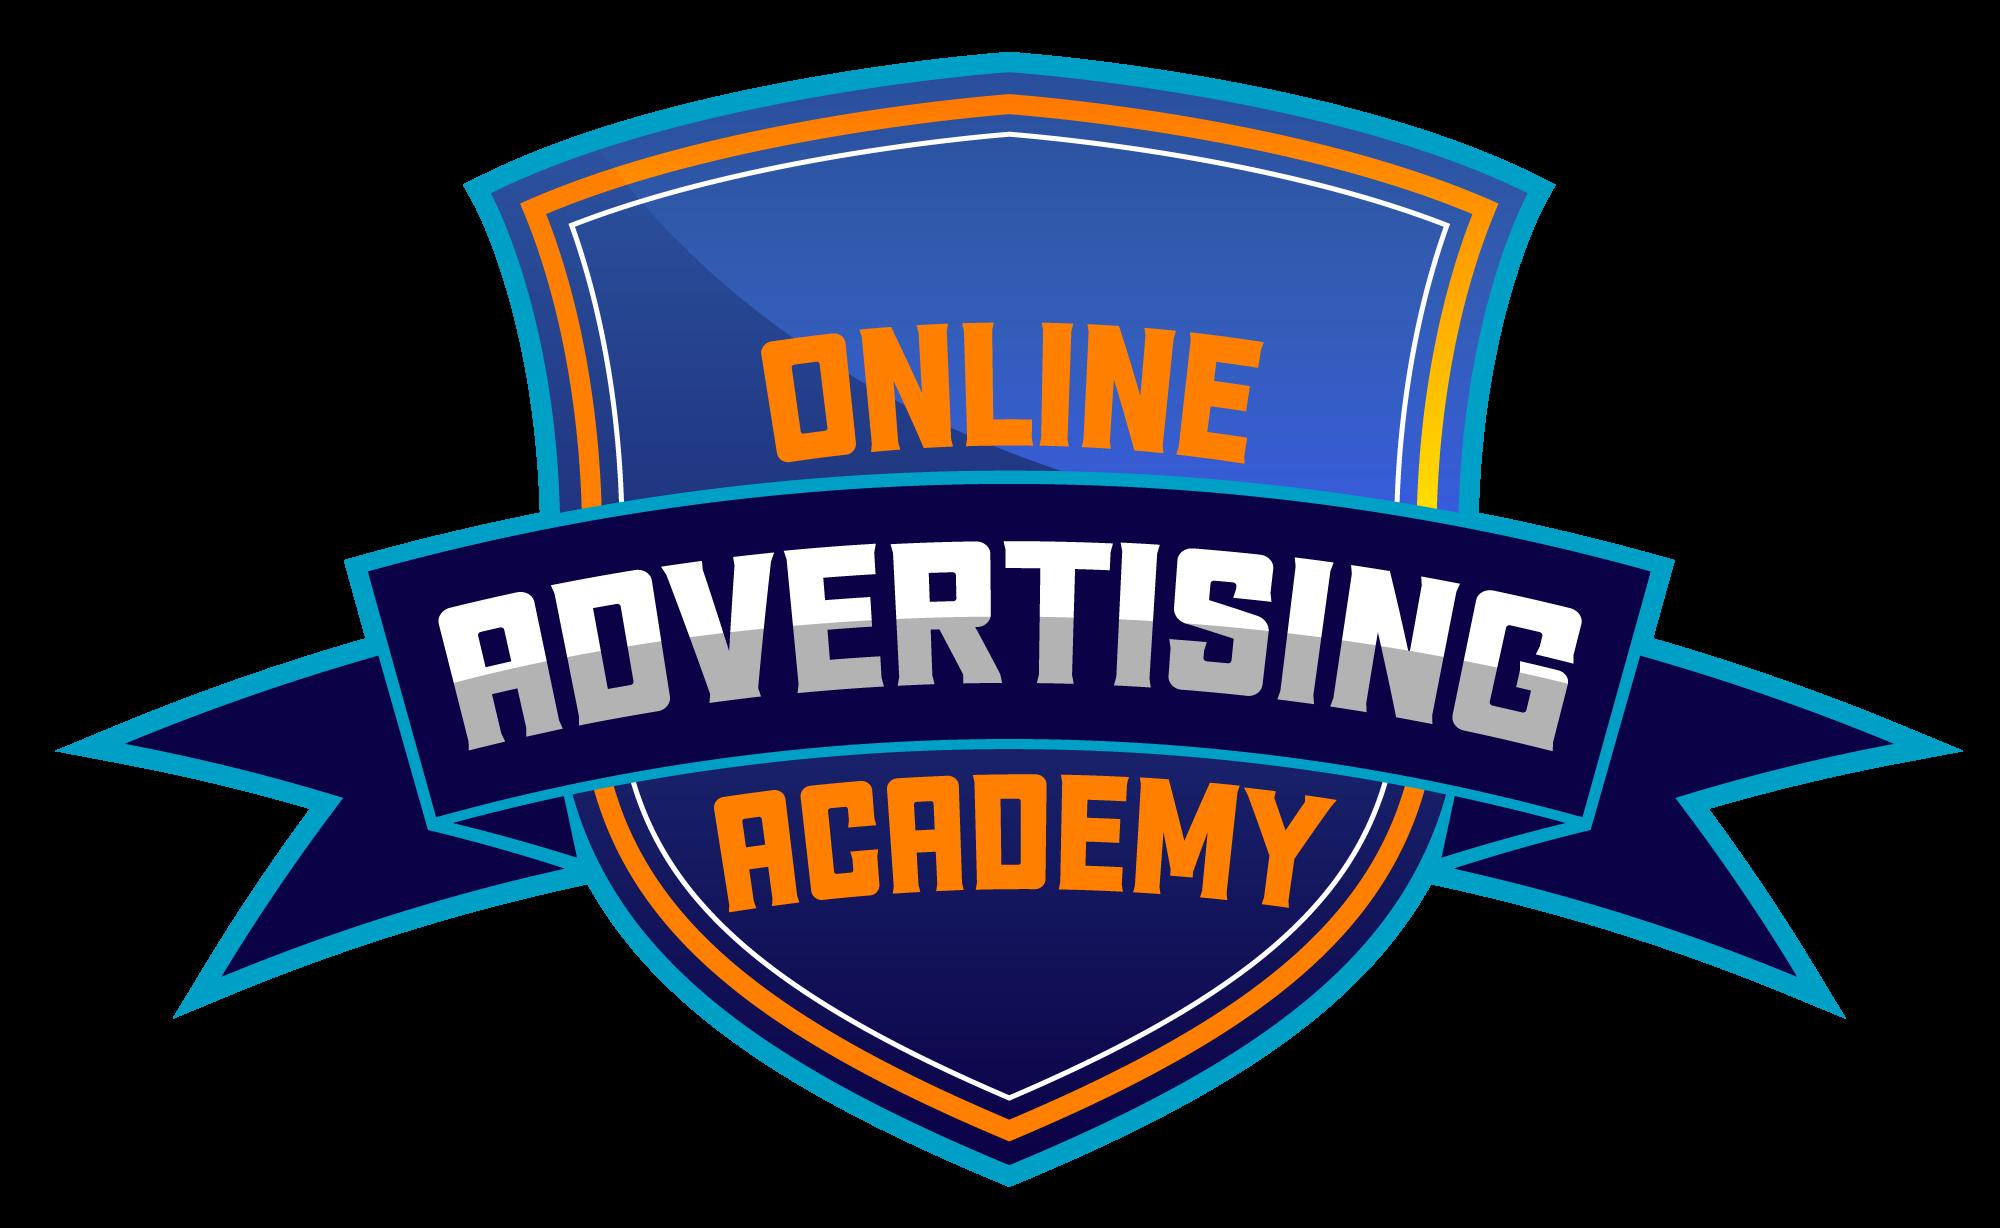 Online Advertising Academy